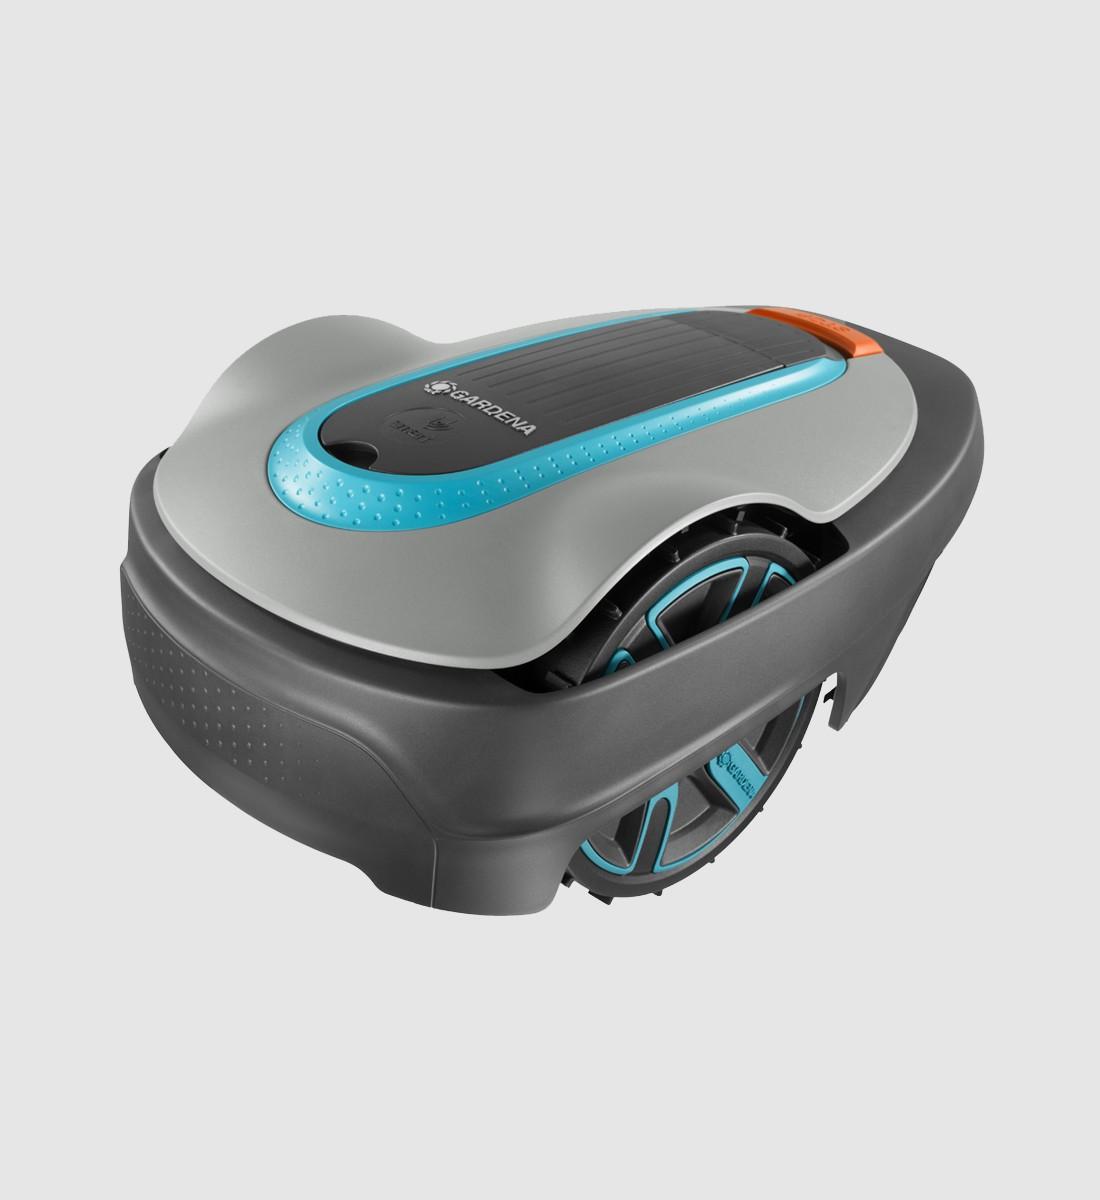 Robotklippare smart Sileno city 500